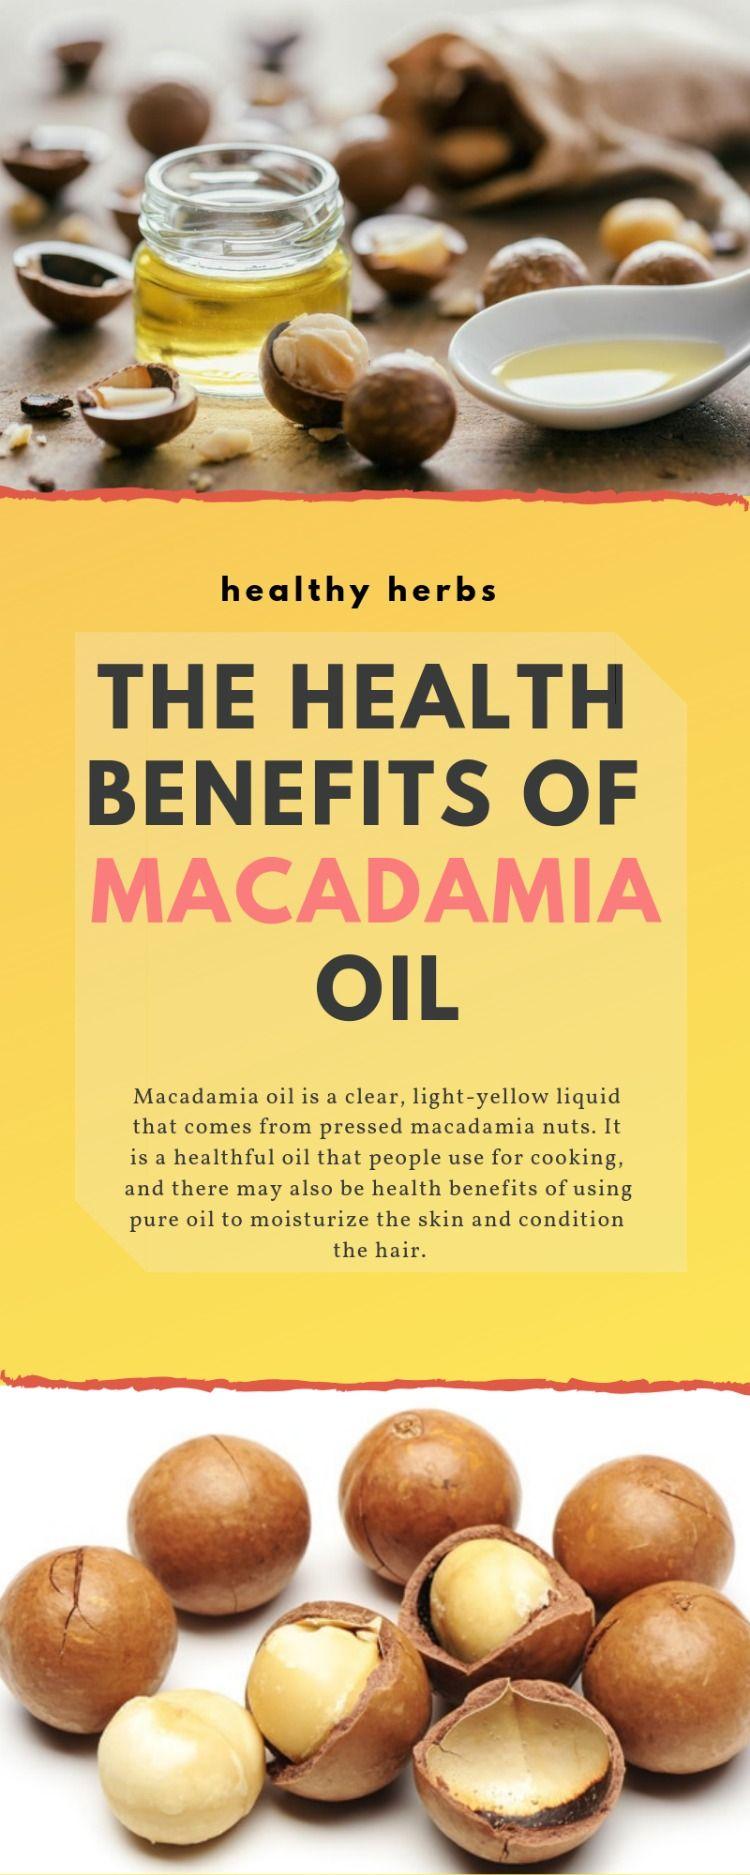 The Health Benefits Of Macadamia Oil Macadamia Oil Macadamia Healthy Herbs